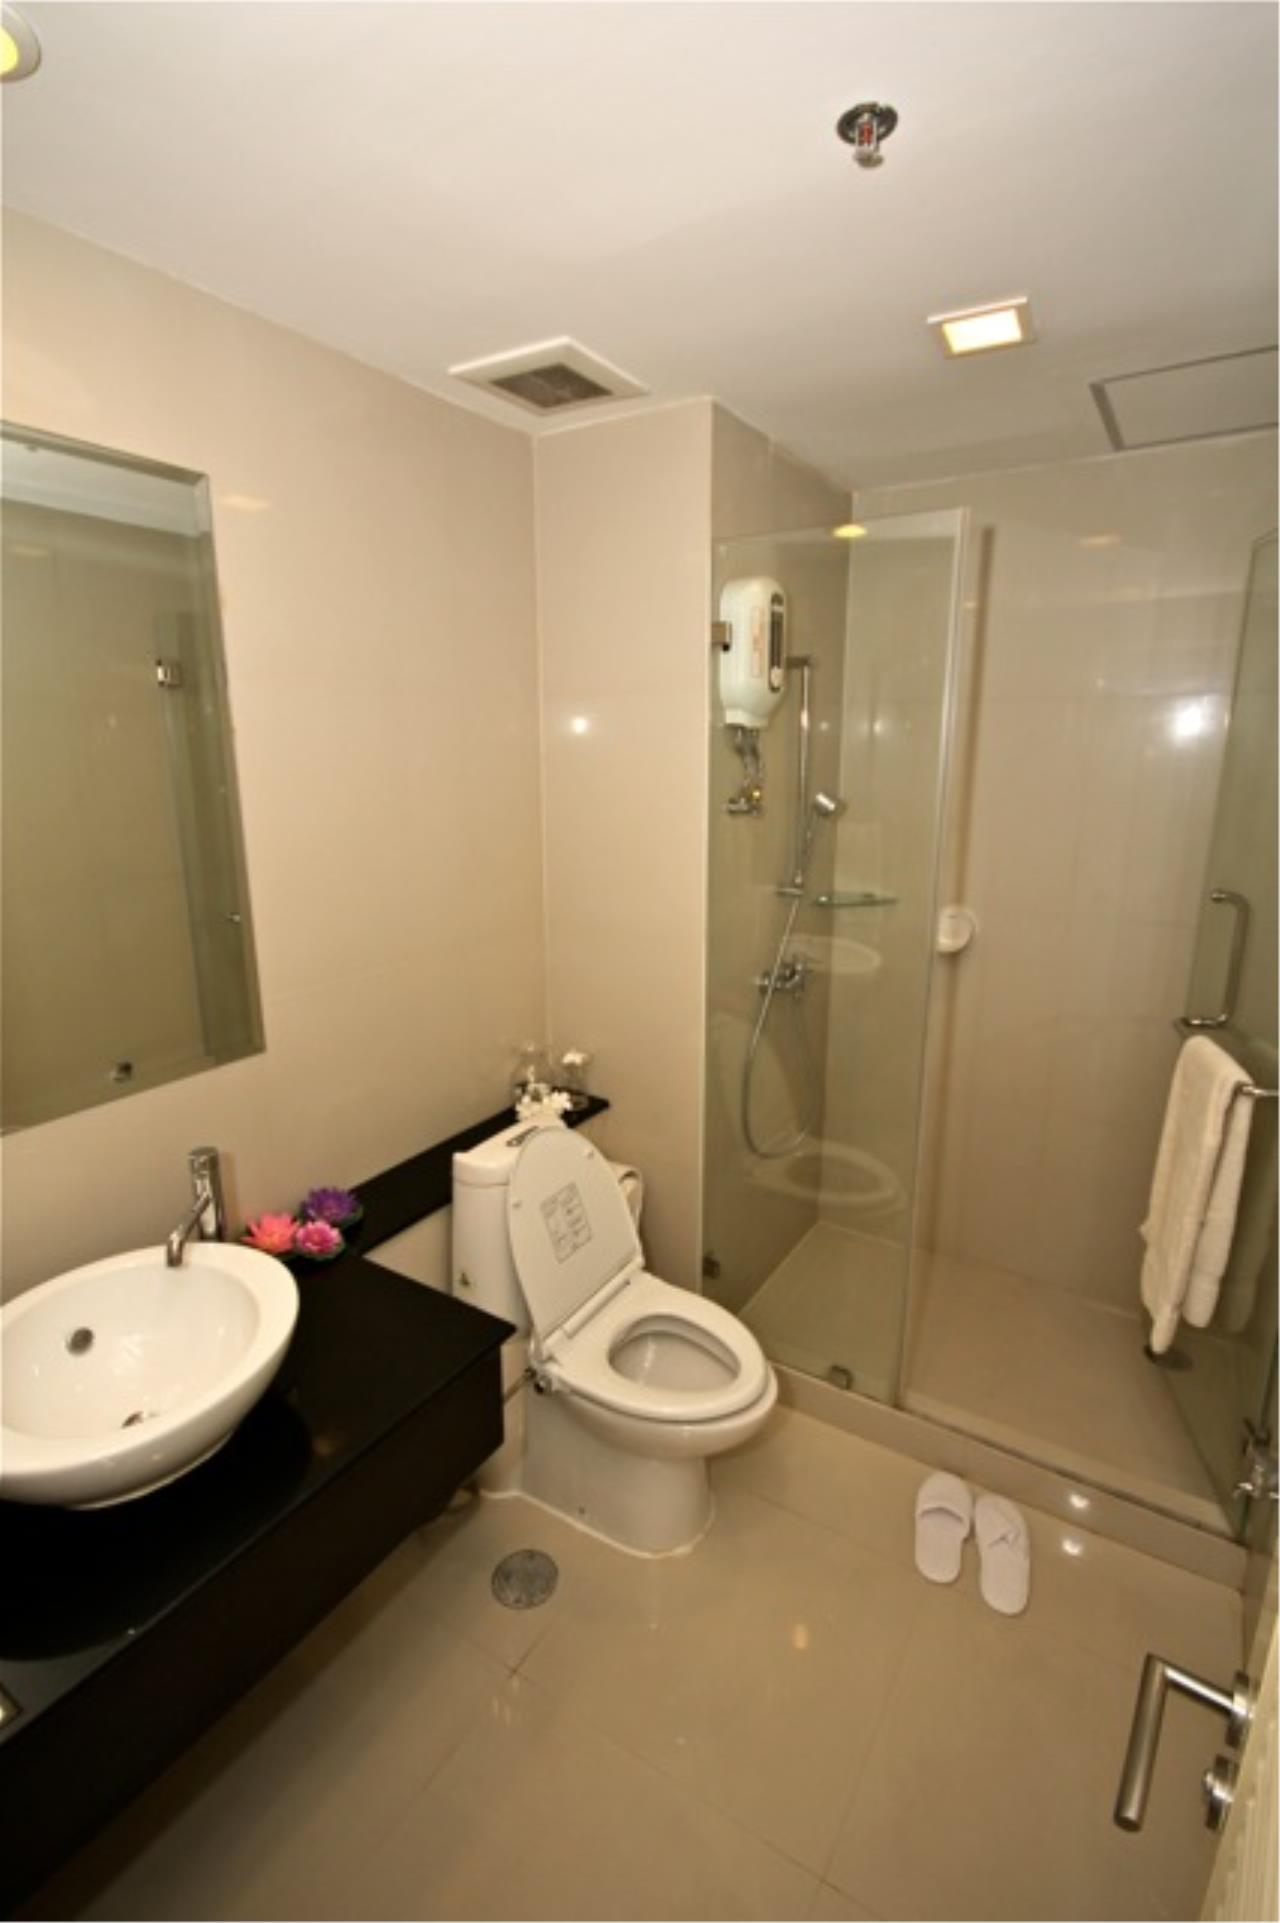 RE/MAX All Star Realty Agency's Nusasiri Grand Ekamai large 1-Bed rent (BTS Ekkamai) 15